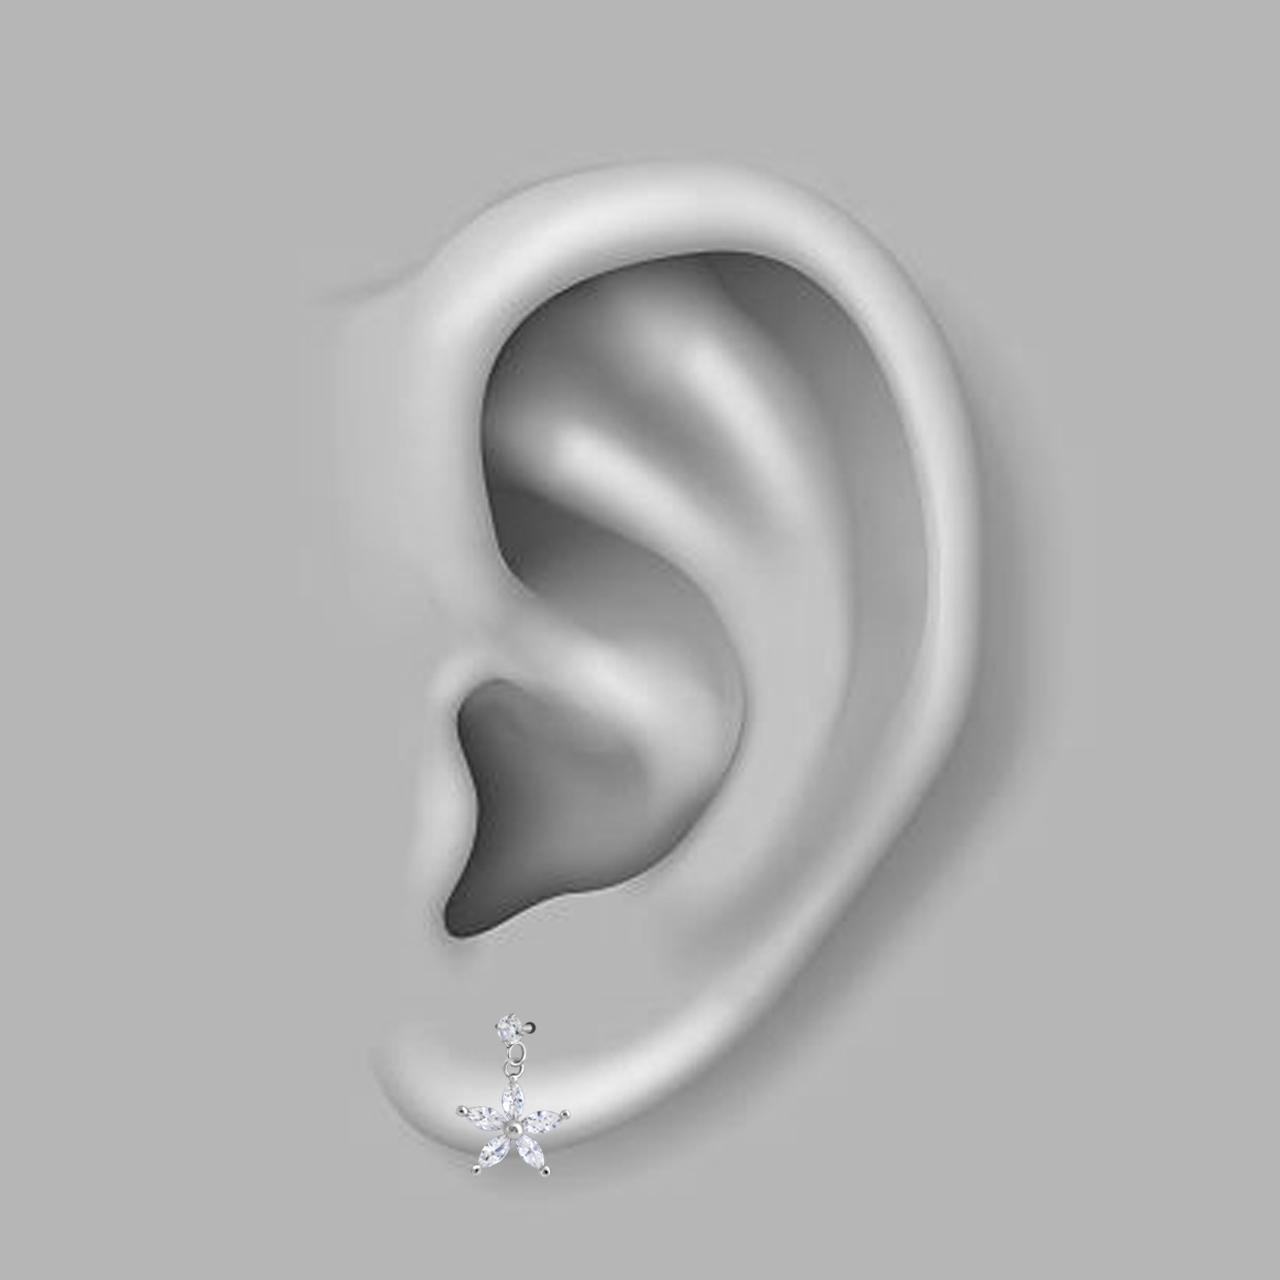 پیرسینگ گوش اقلیمه کد HS62